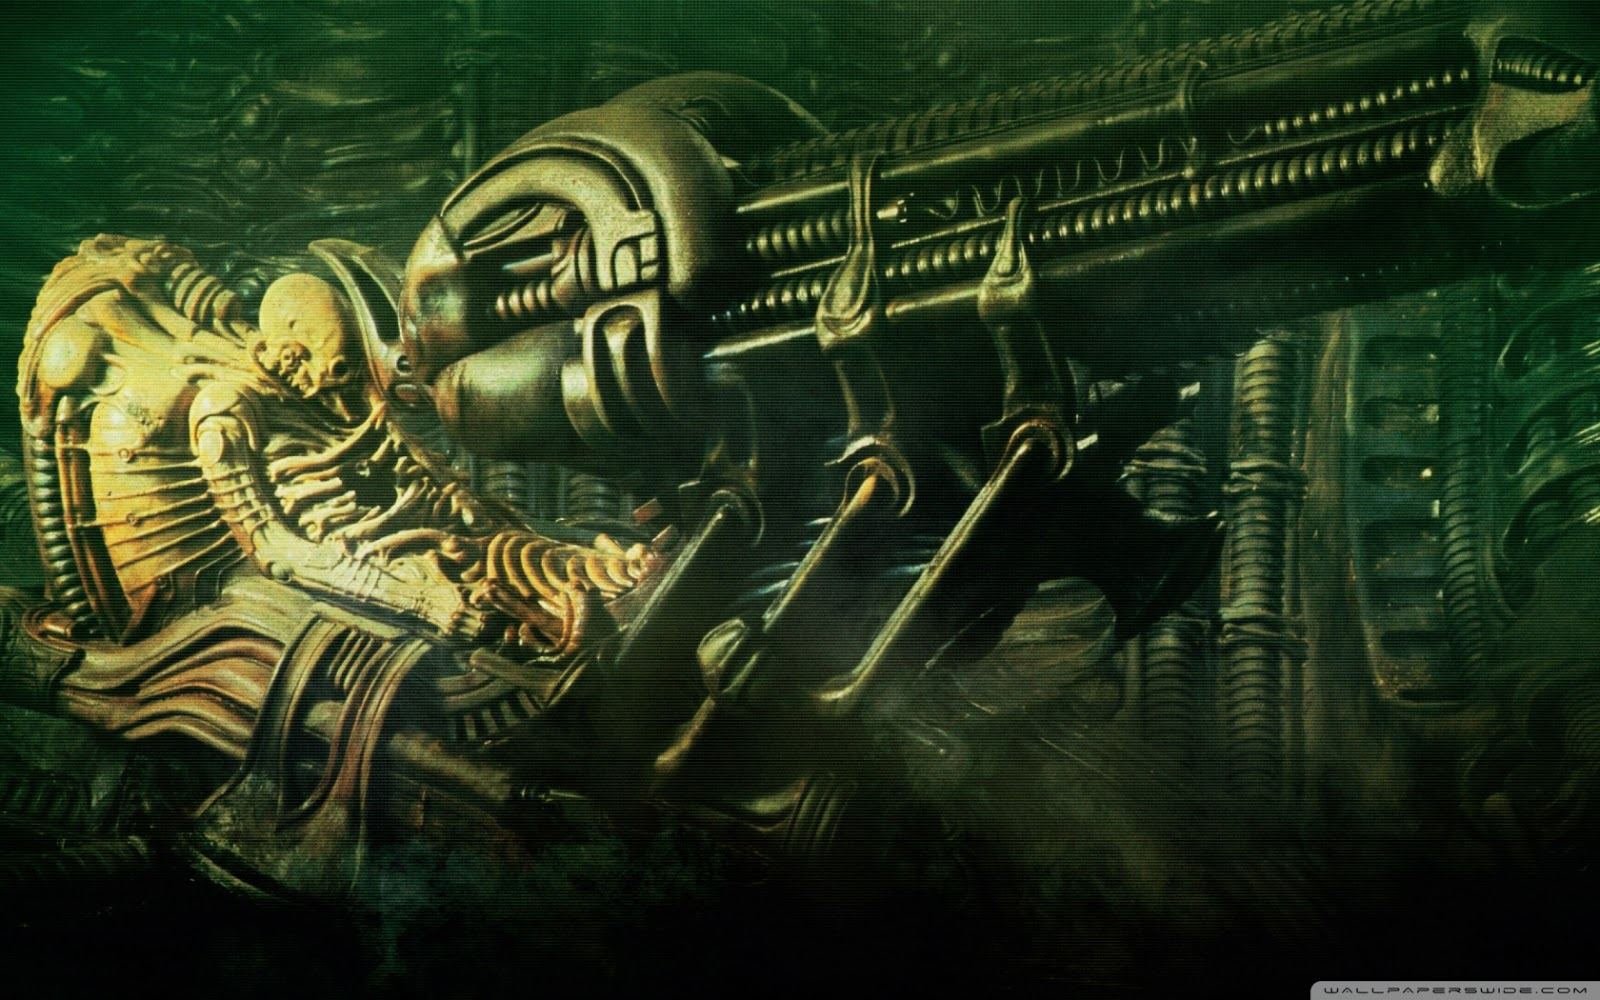 alien 3D gun wallpaper Blast of Wallpapers 1600x1000